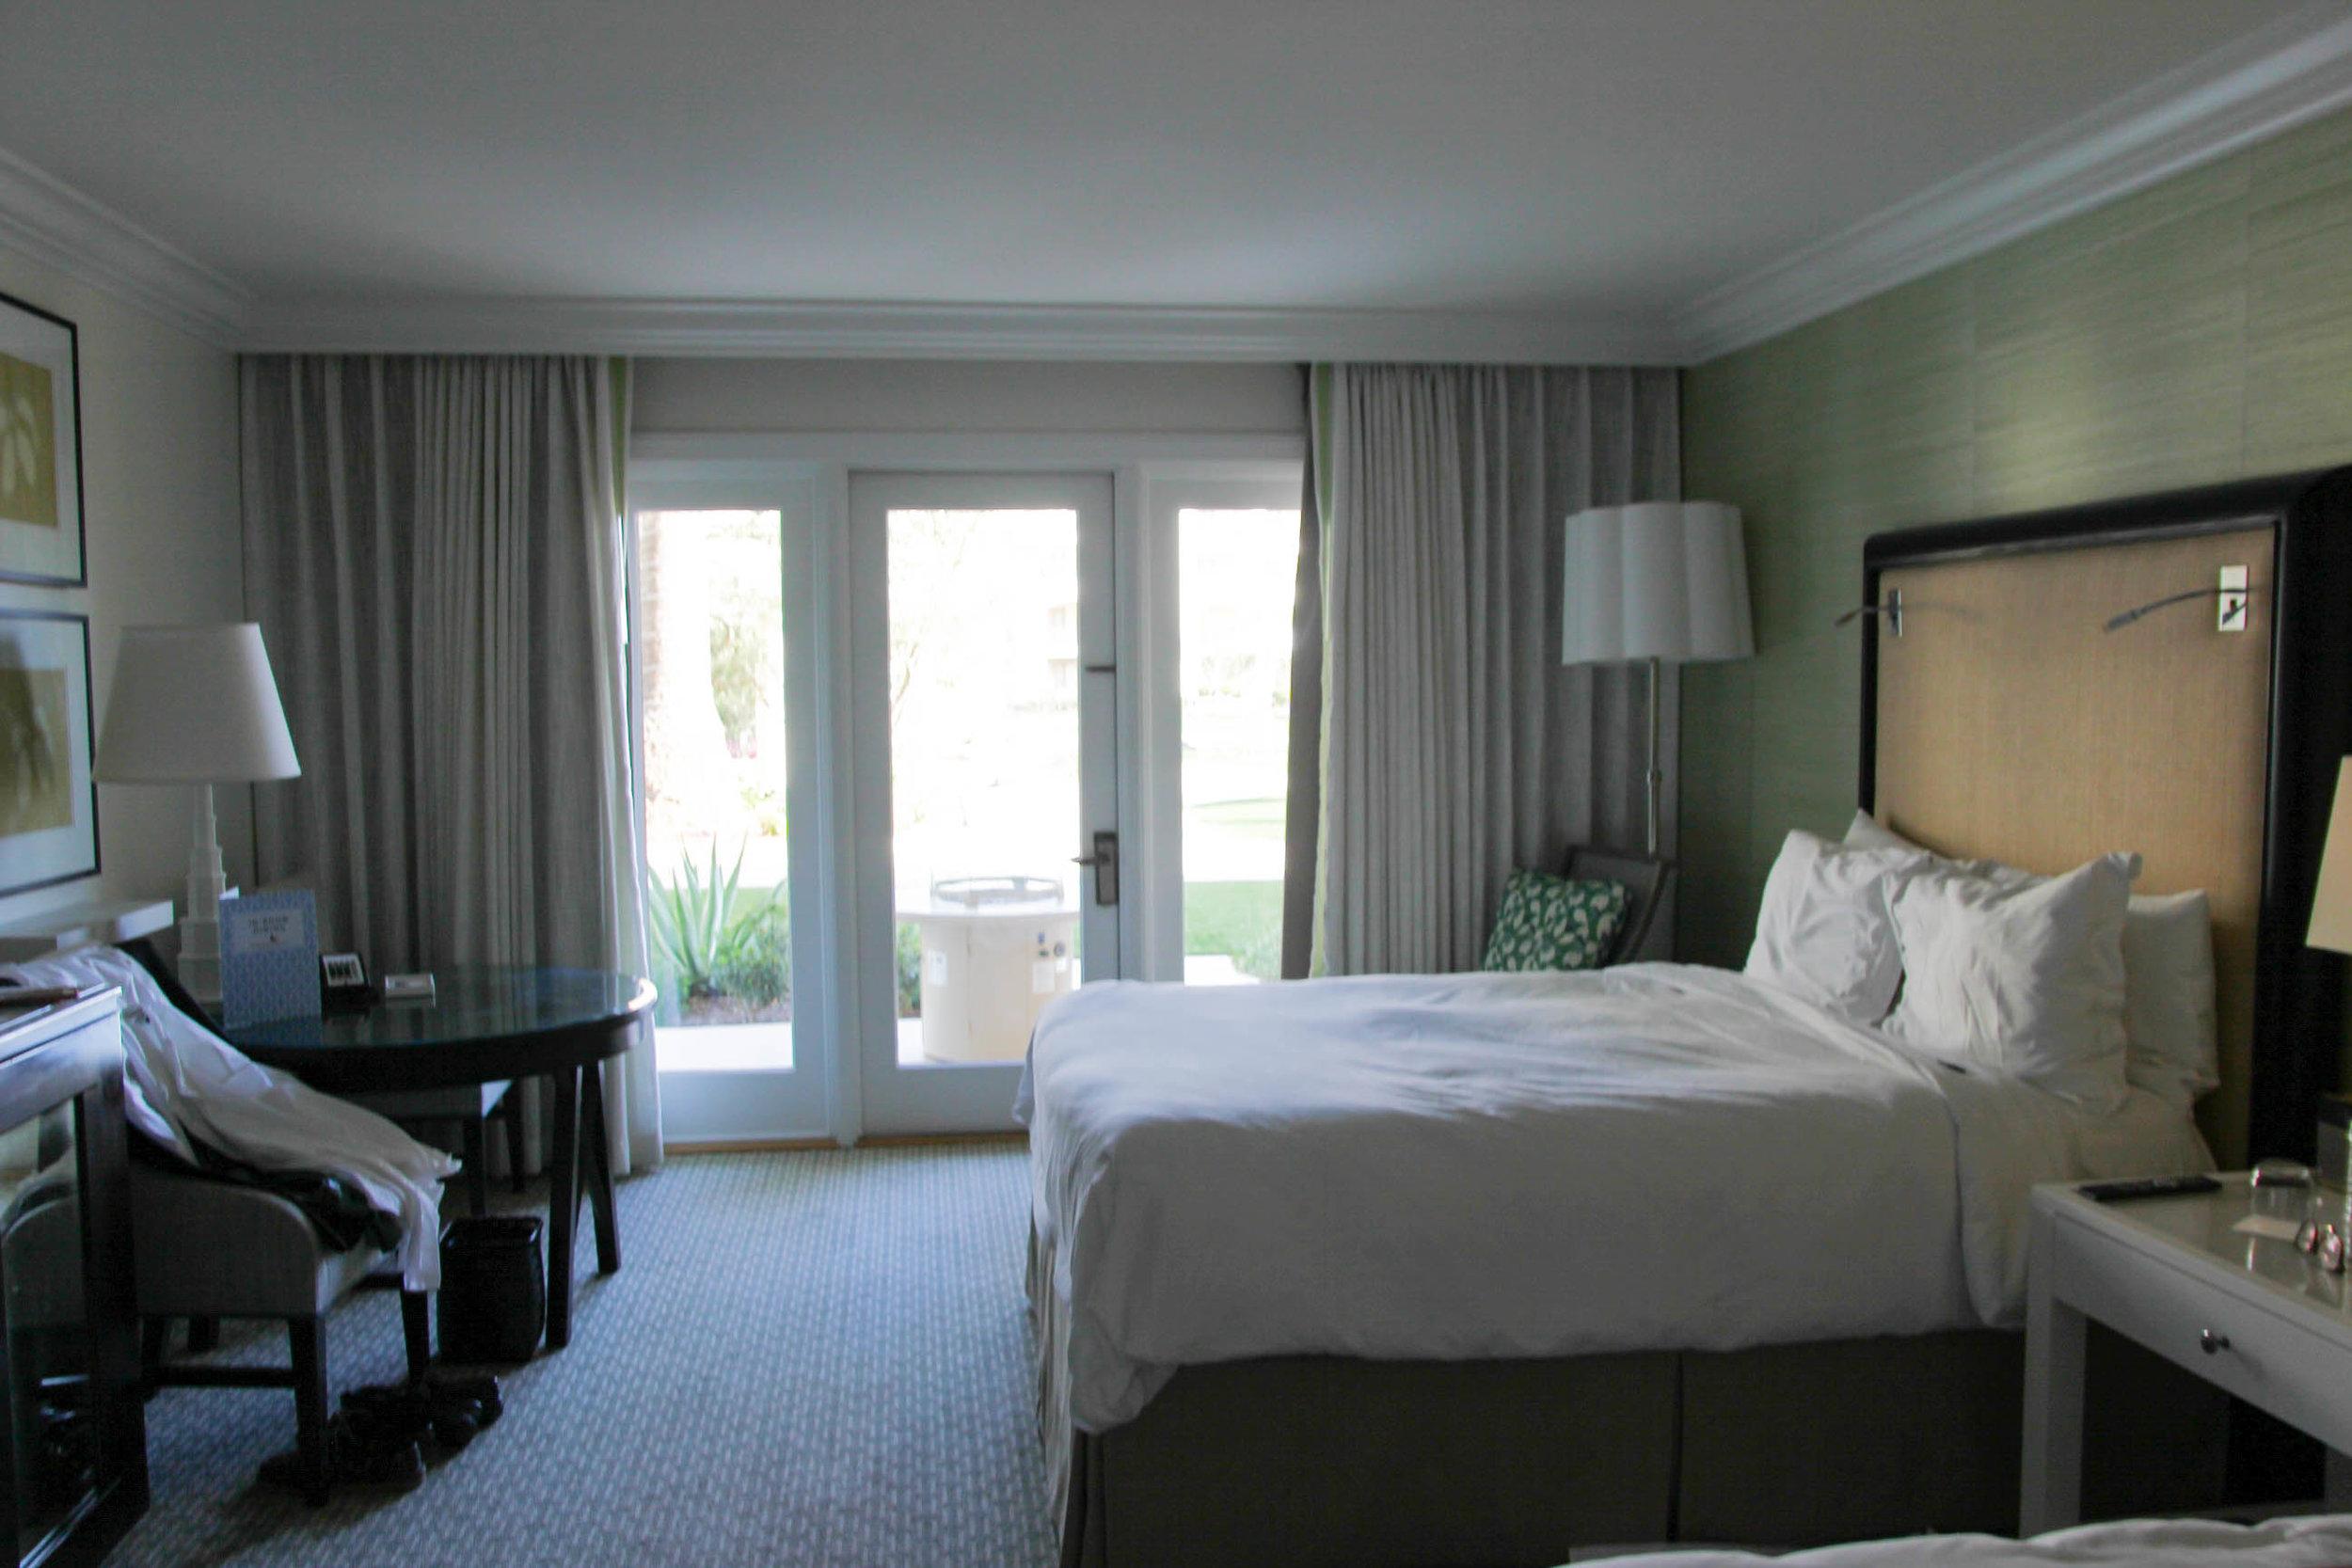 where to stay in laguna beach, laguna beach resorts, laguna beach hotels, monarch beach resort, dana point, visit california, resorts with patios